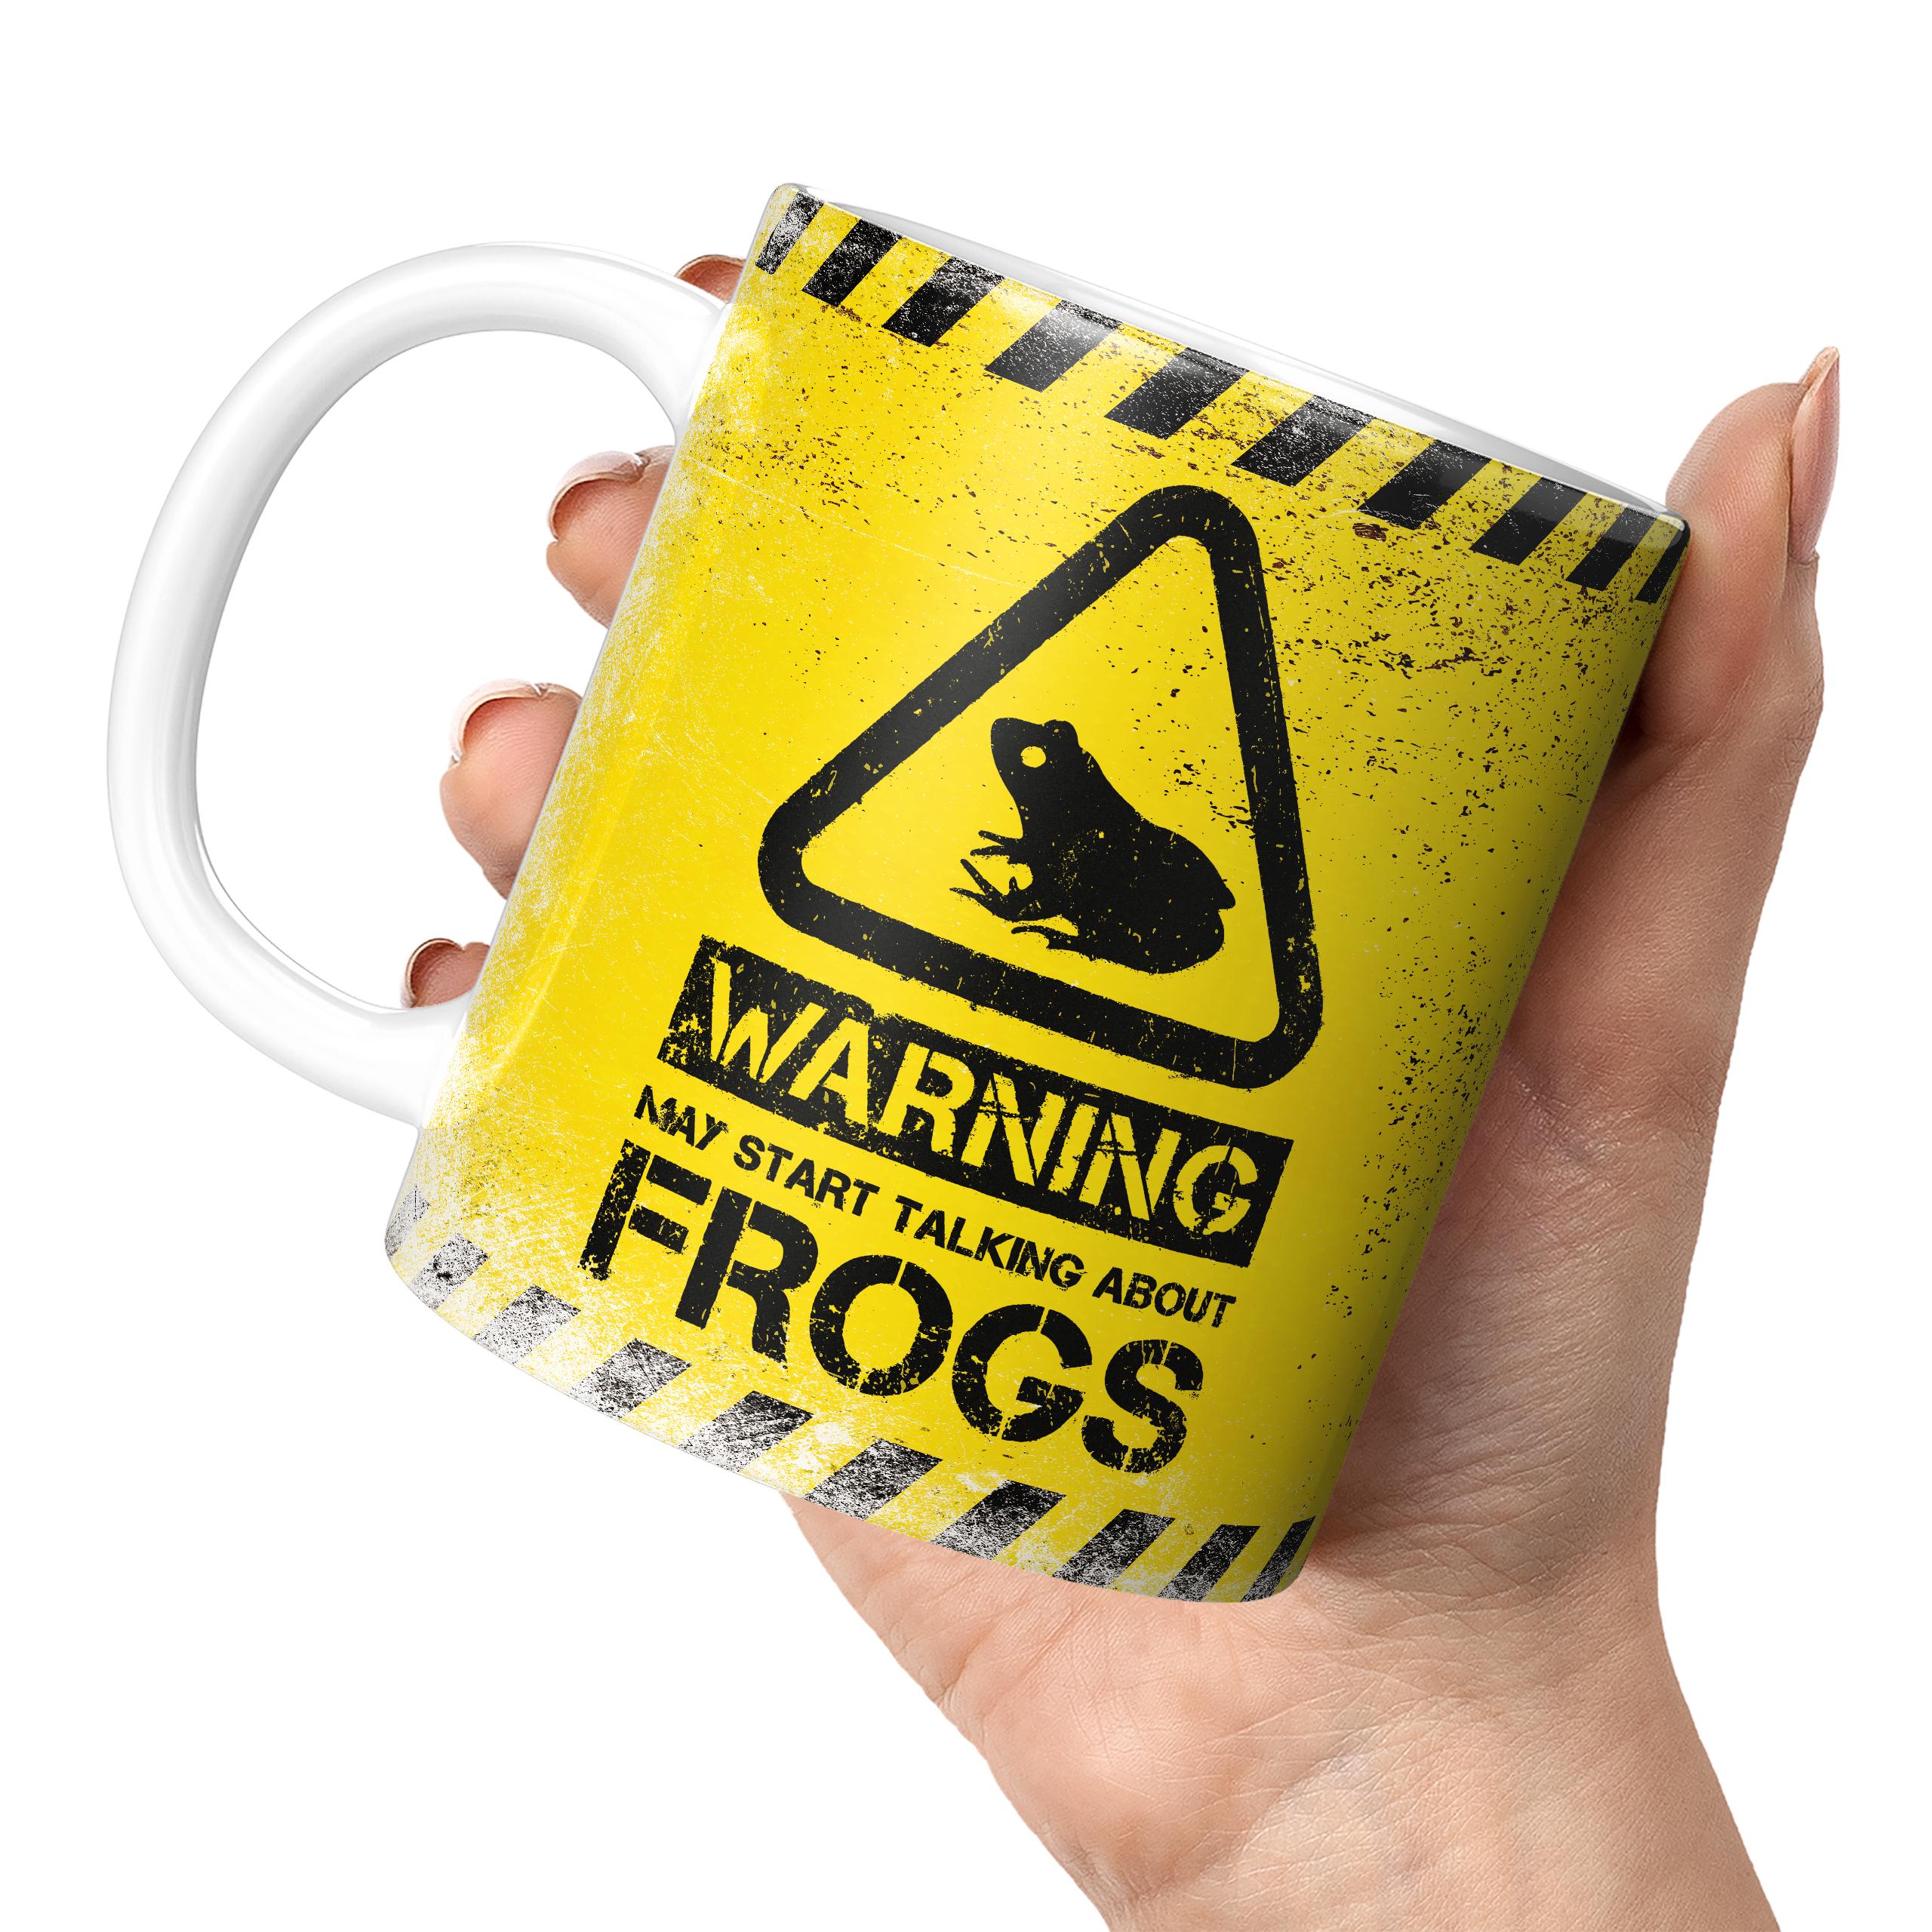 WARNING MAY START TALKING ABOUT FROGS 11oz NOVELTY MUG Mugs